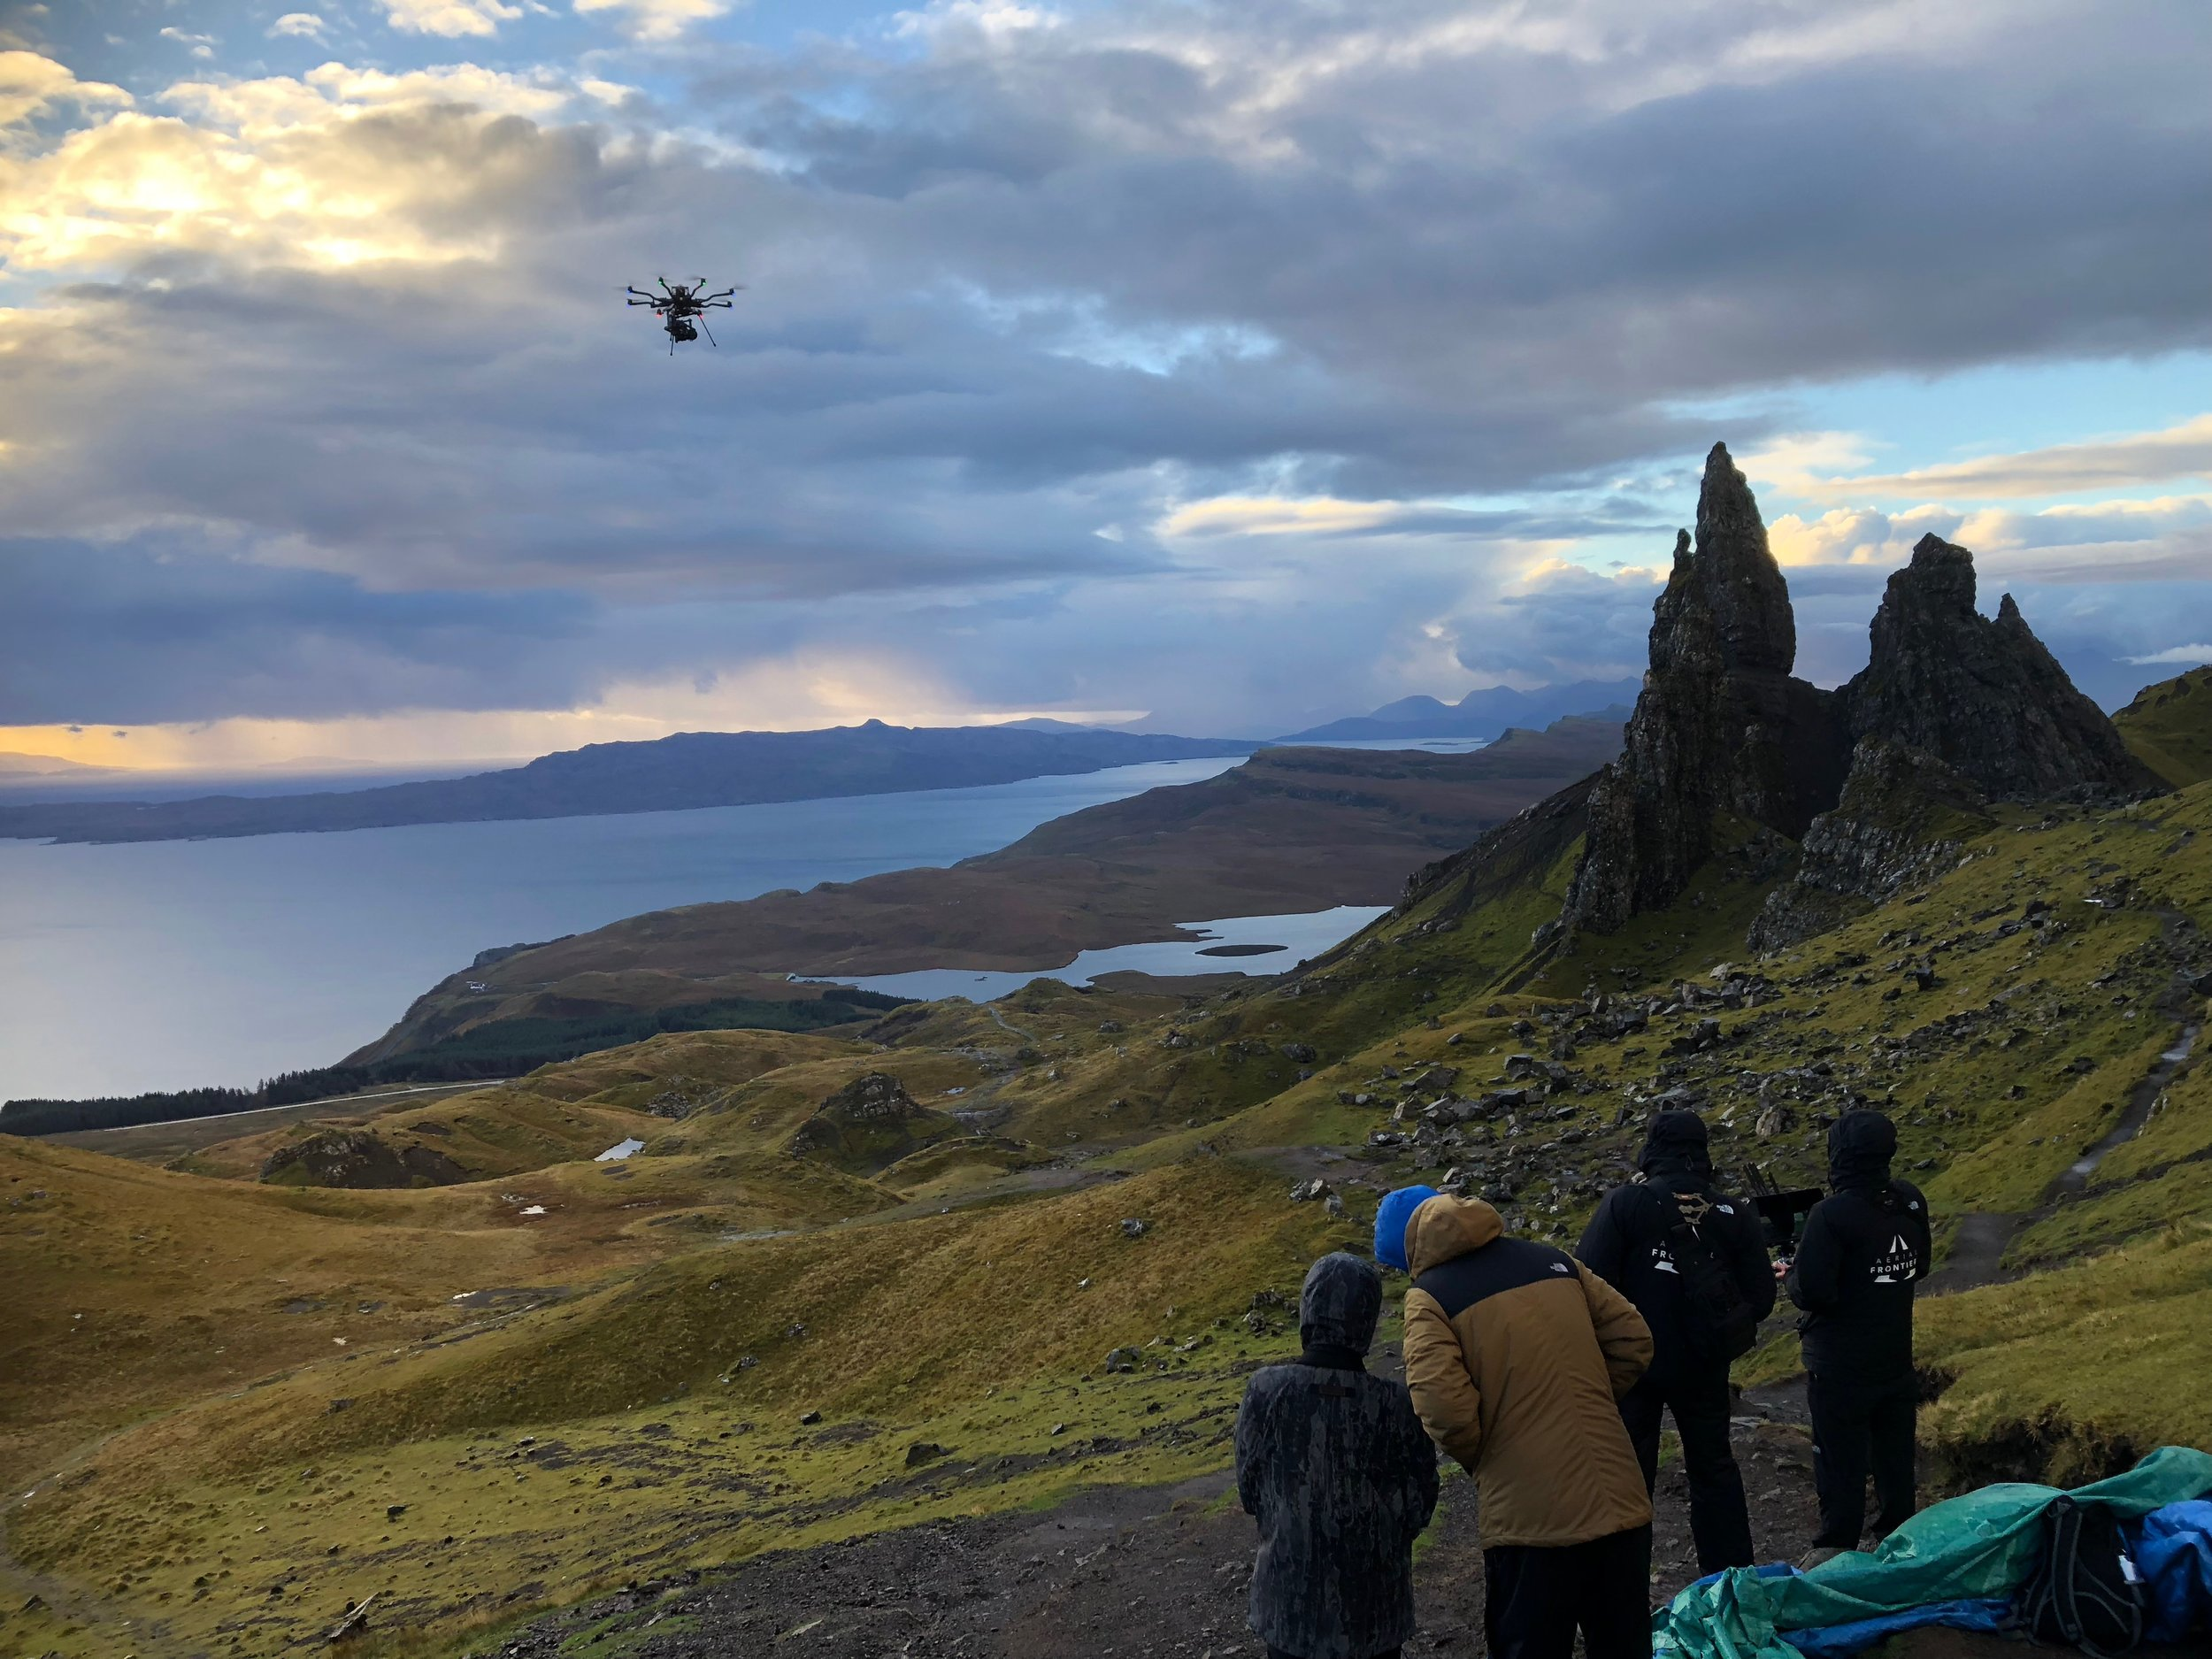 Alta 8 heavy lift drone